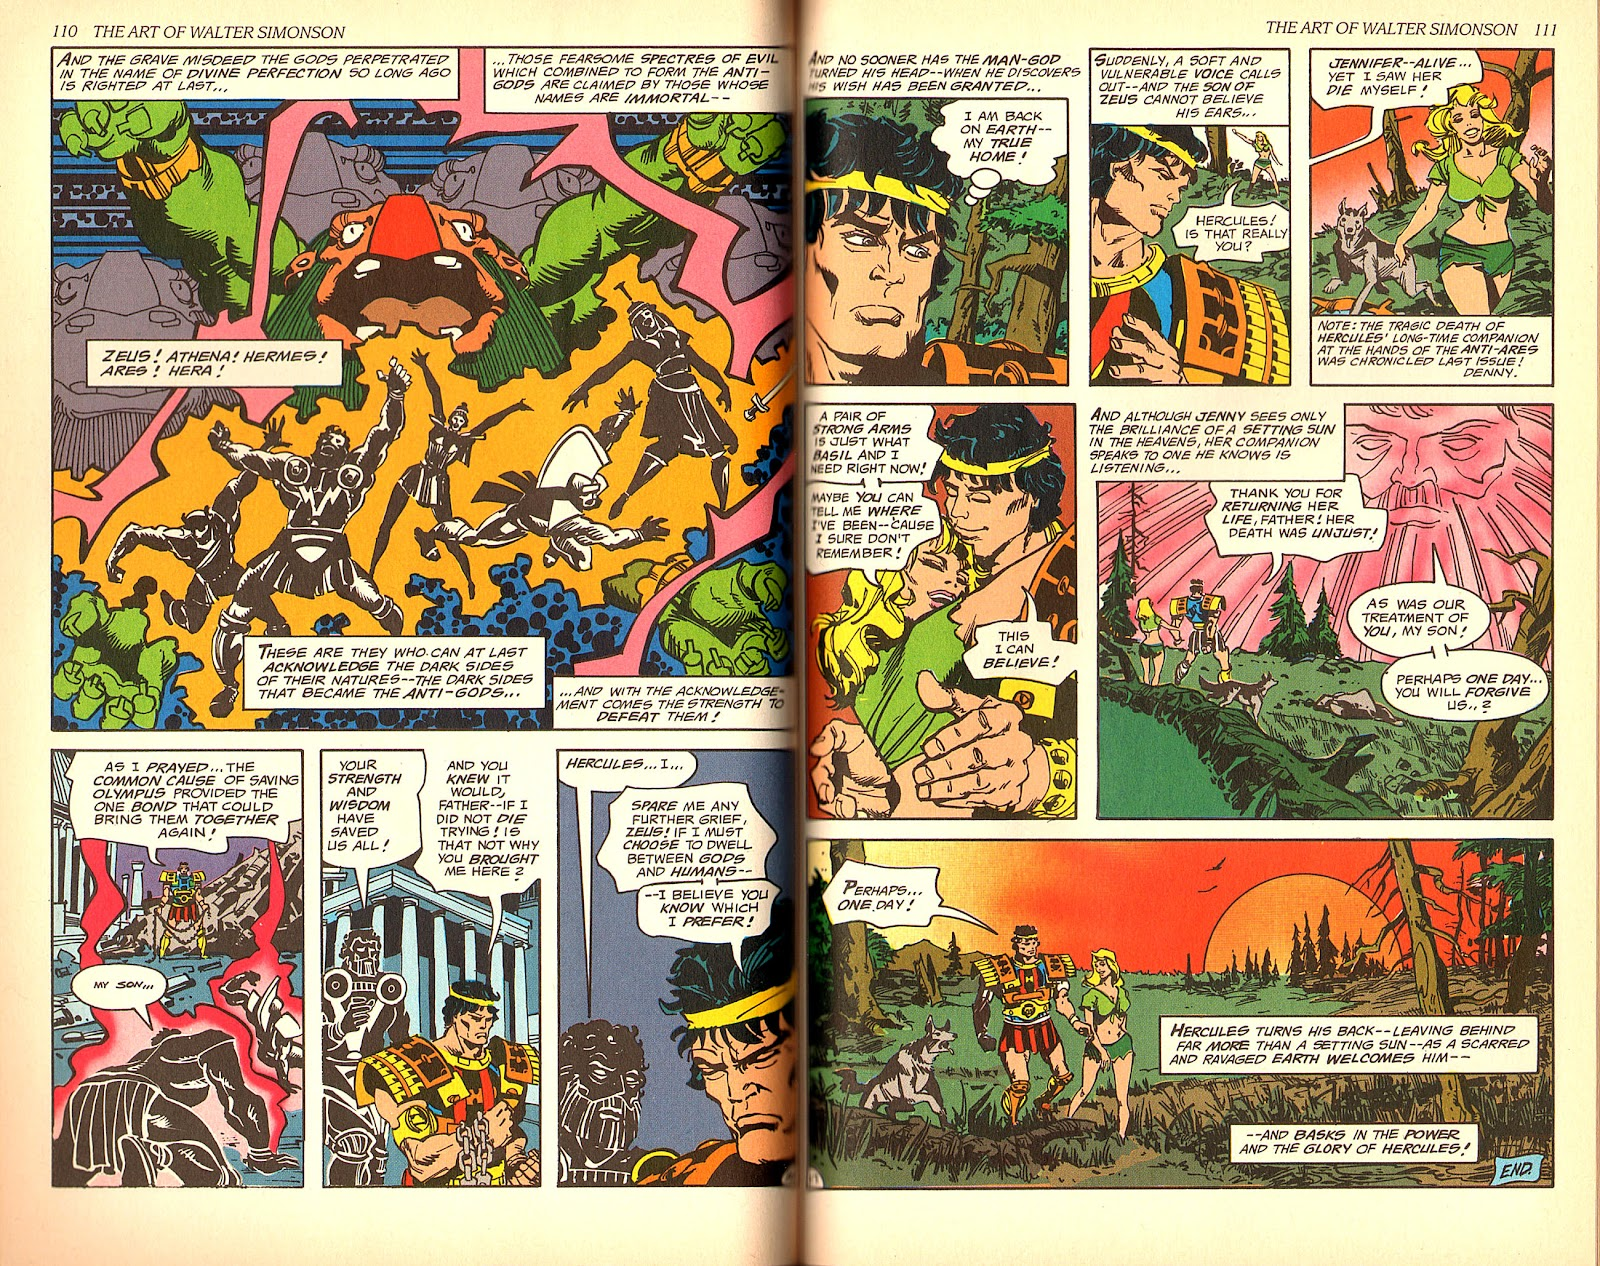 Read online The Art of Walter Simonson comic -  Issue # TPB - 57